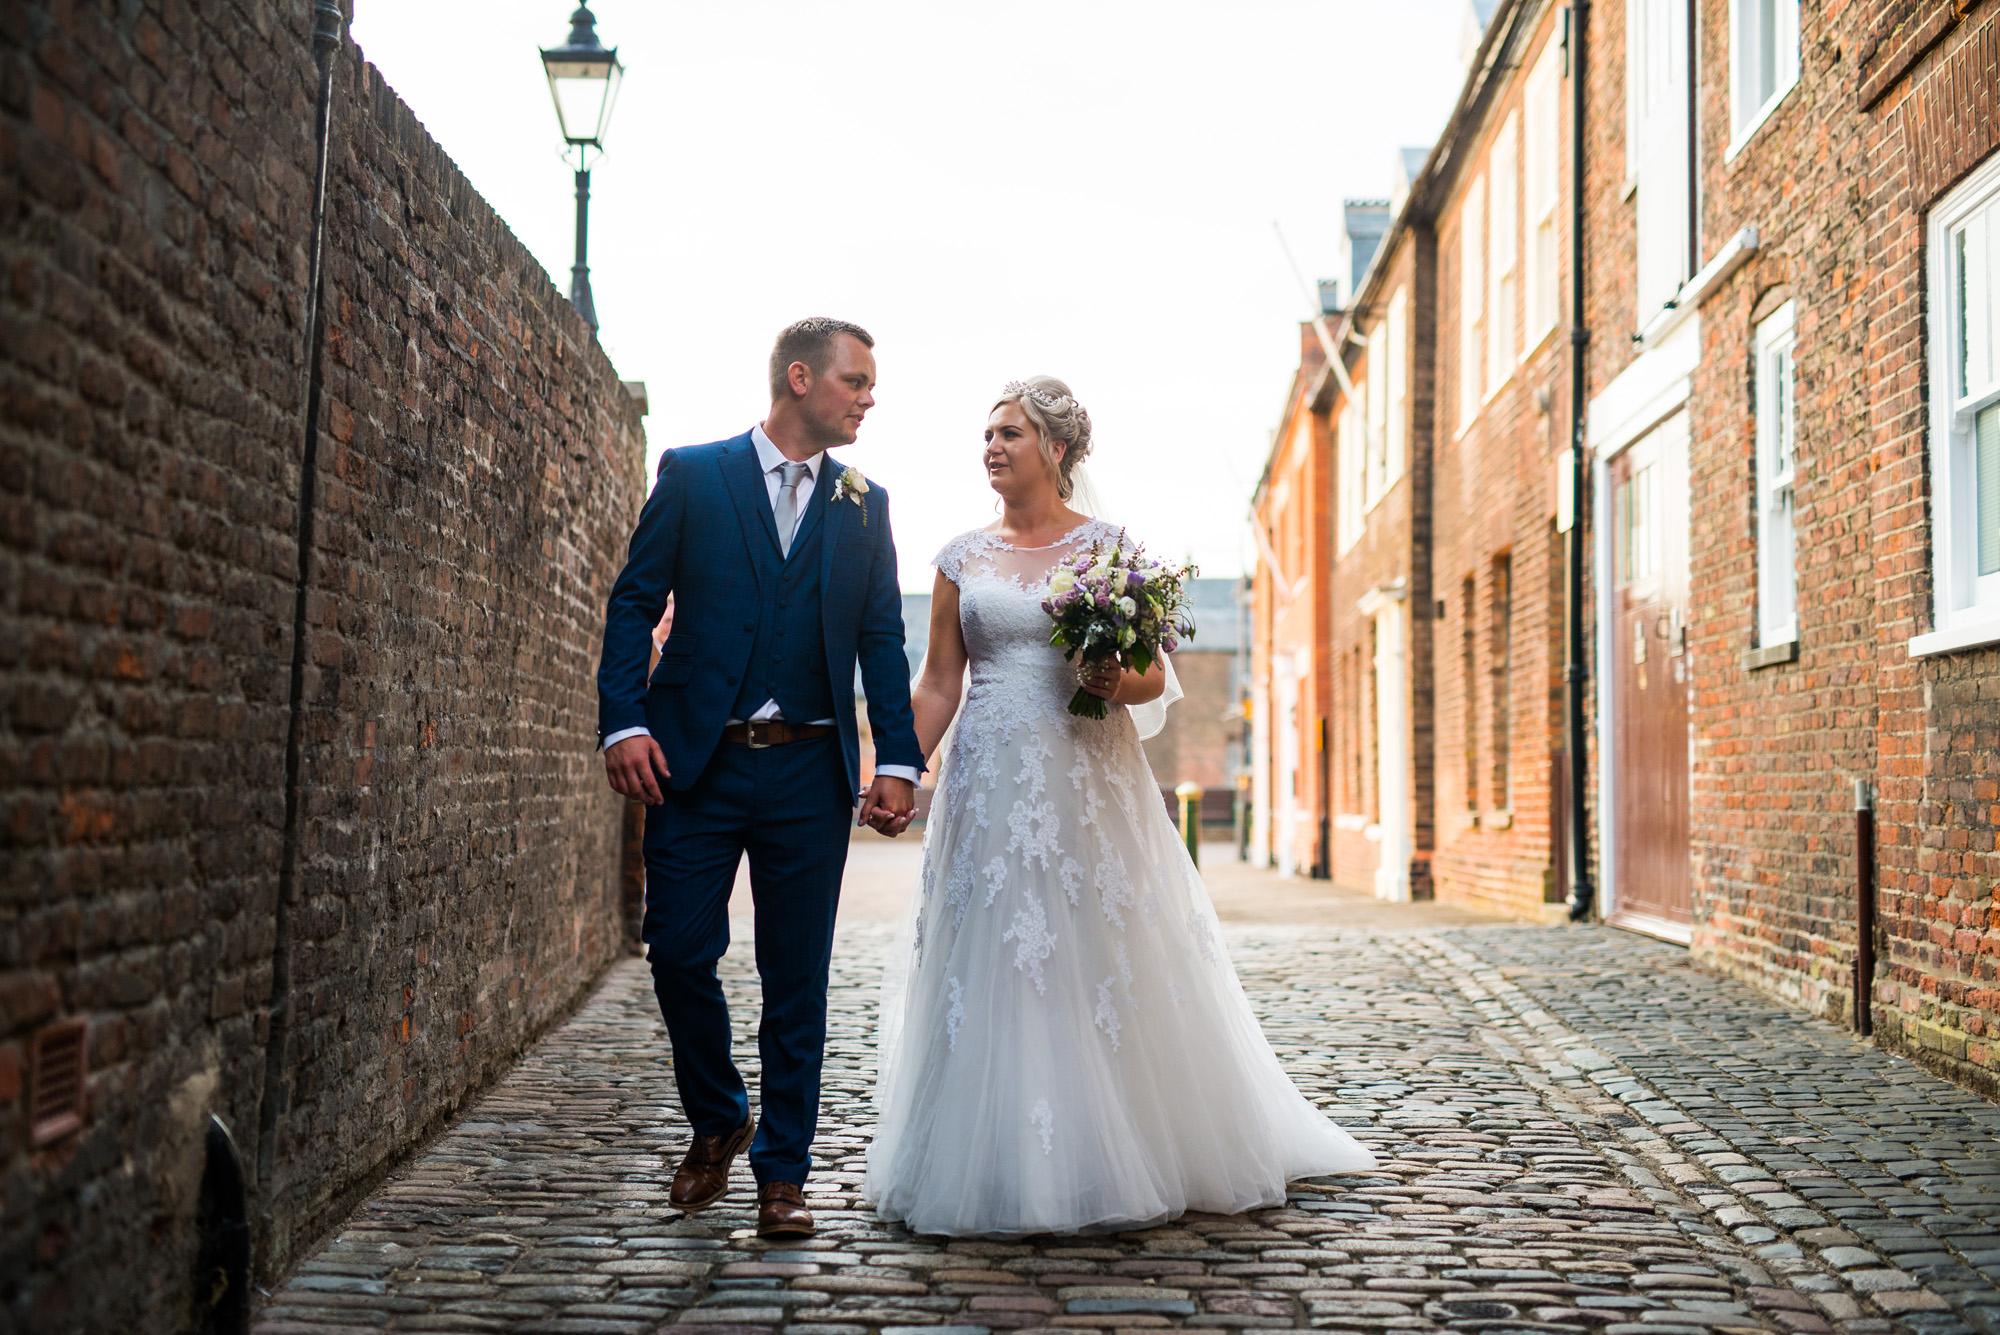 Savannah and Josh wedding photos (299 of 350).jpg